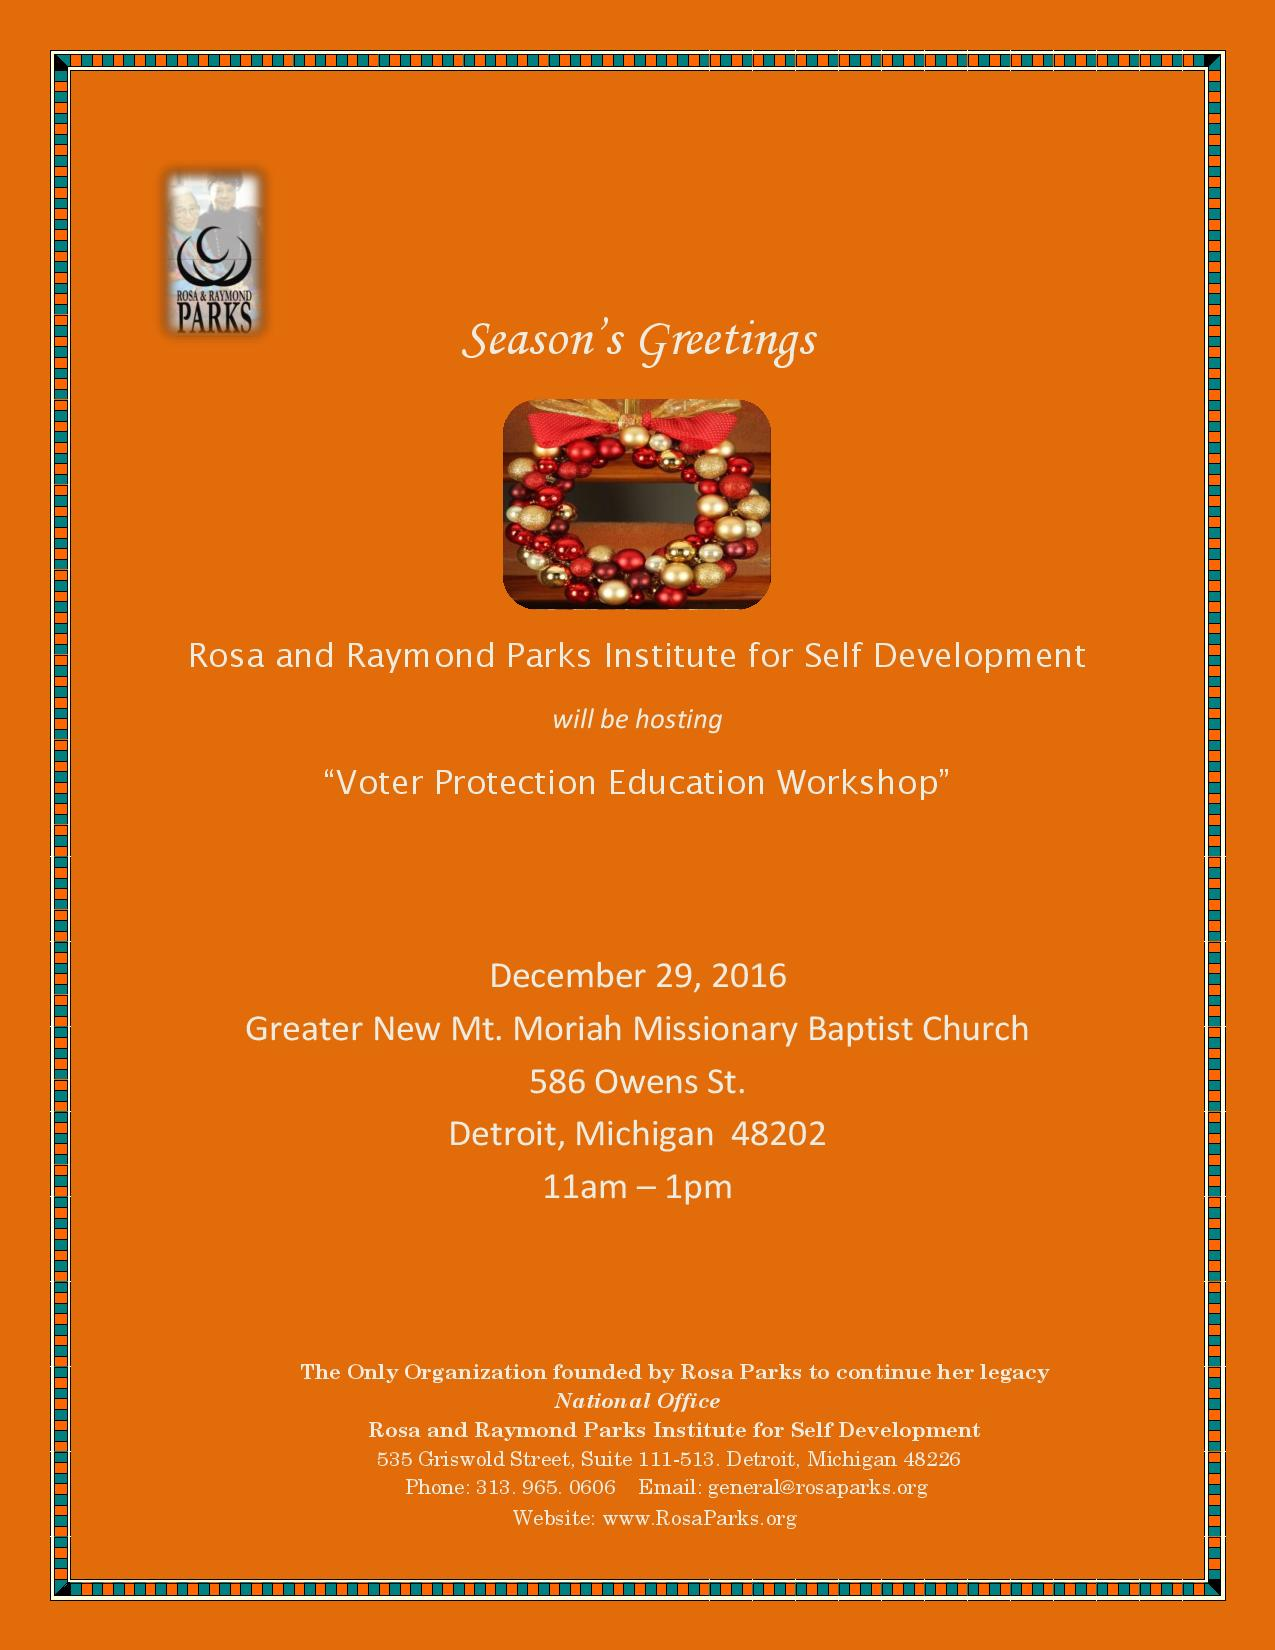 12-21-16-voter-protection-education-workshop-revised